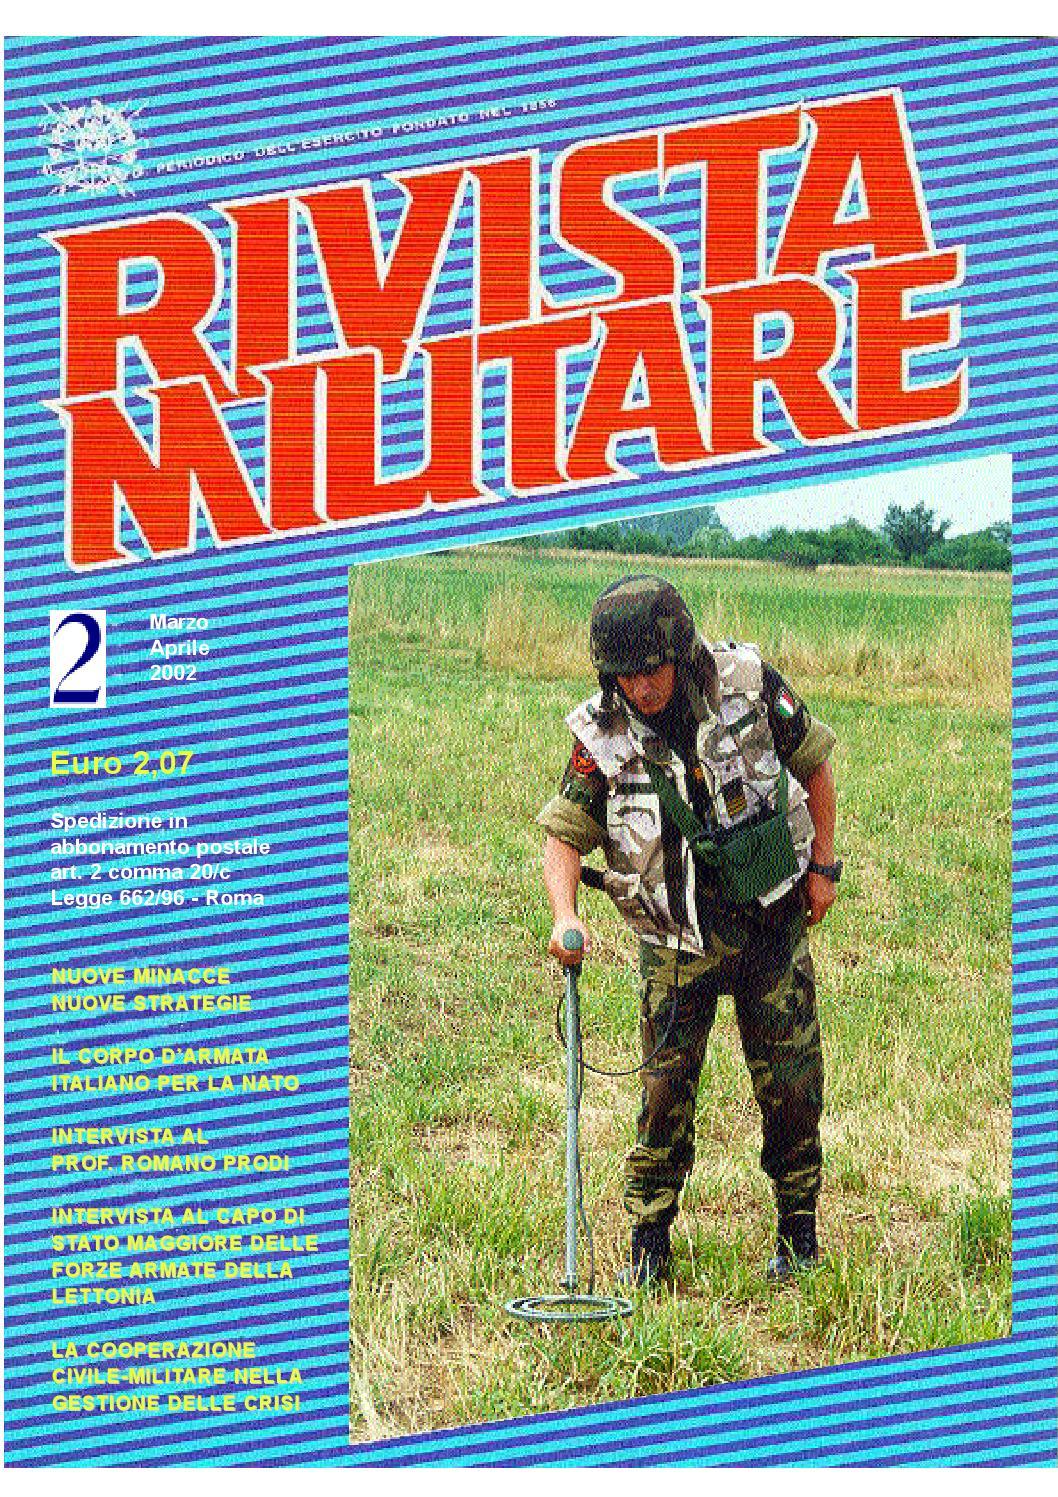 RIVISTA MILITARE 2002 N.2 by Biblioteca Militare - issuu 2bc88658c1e8